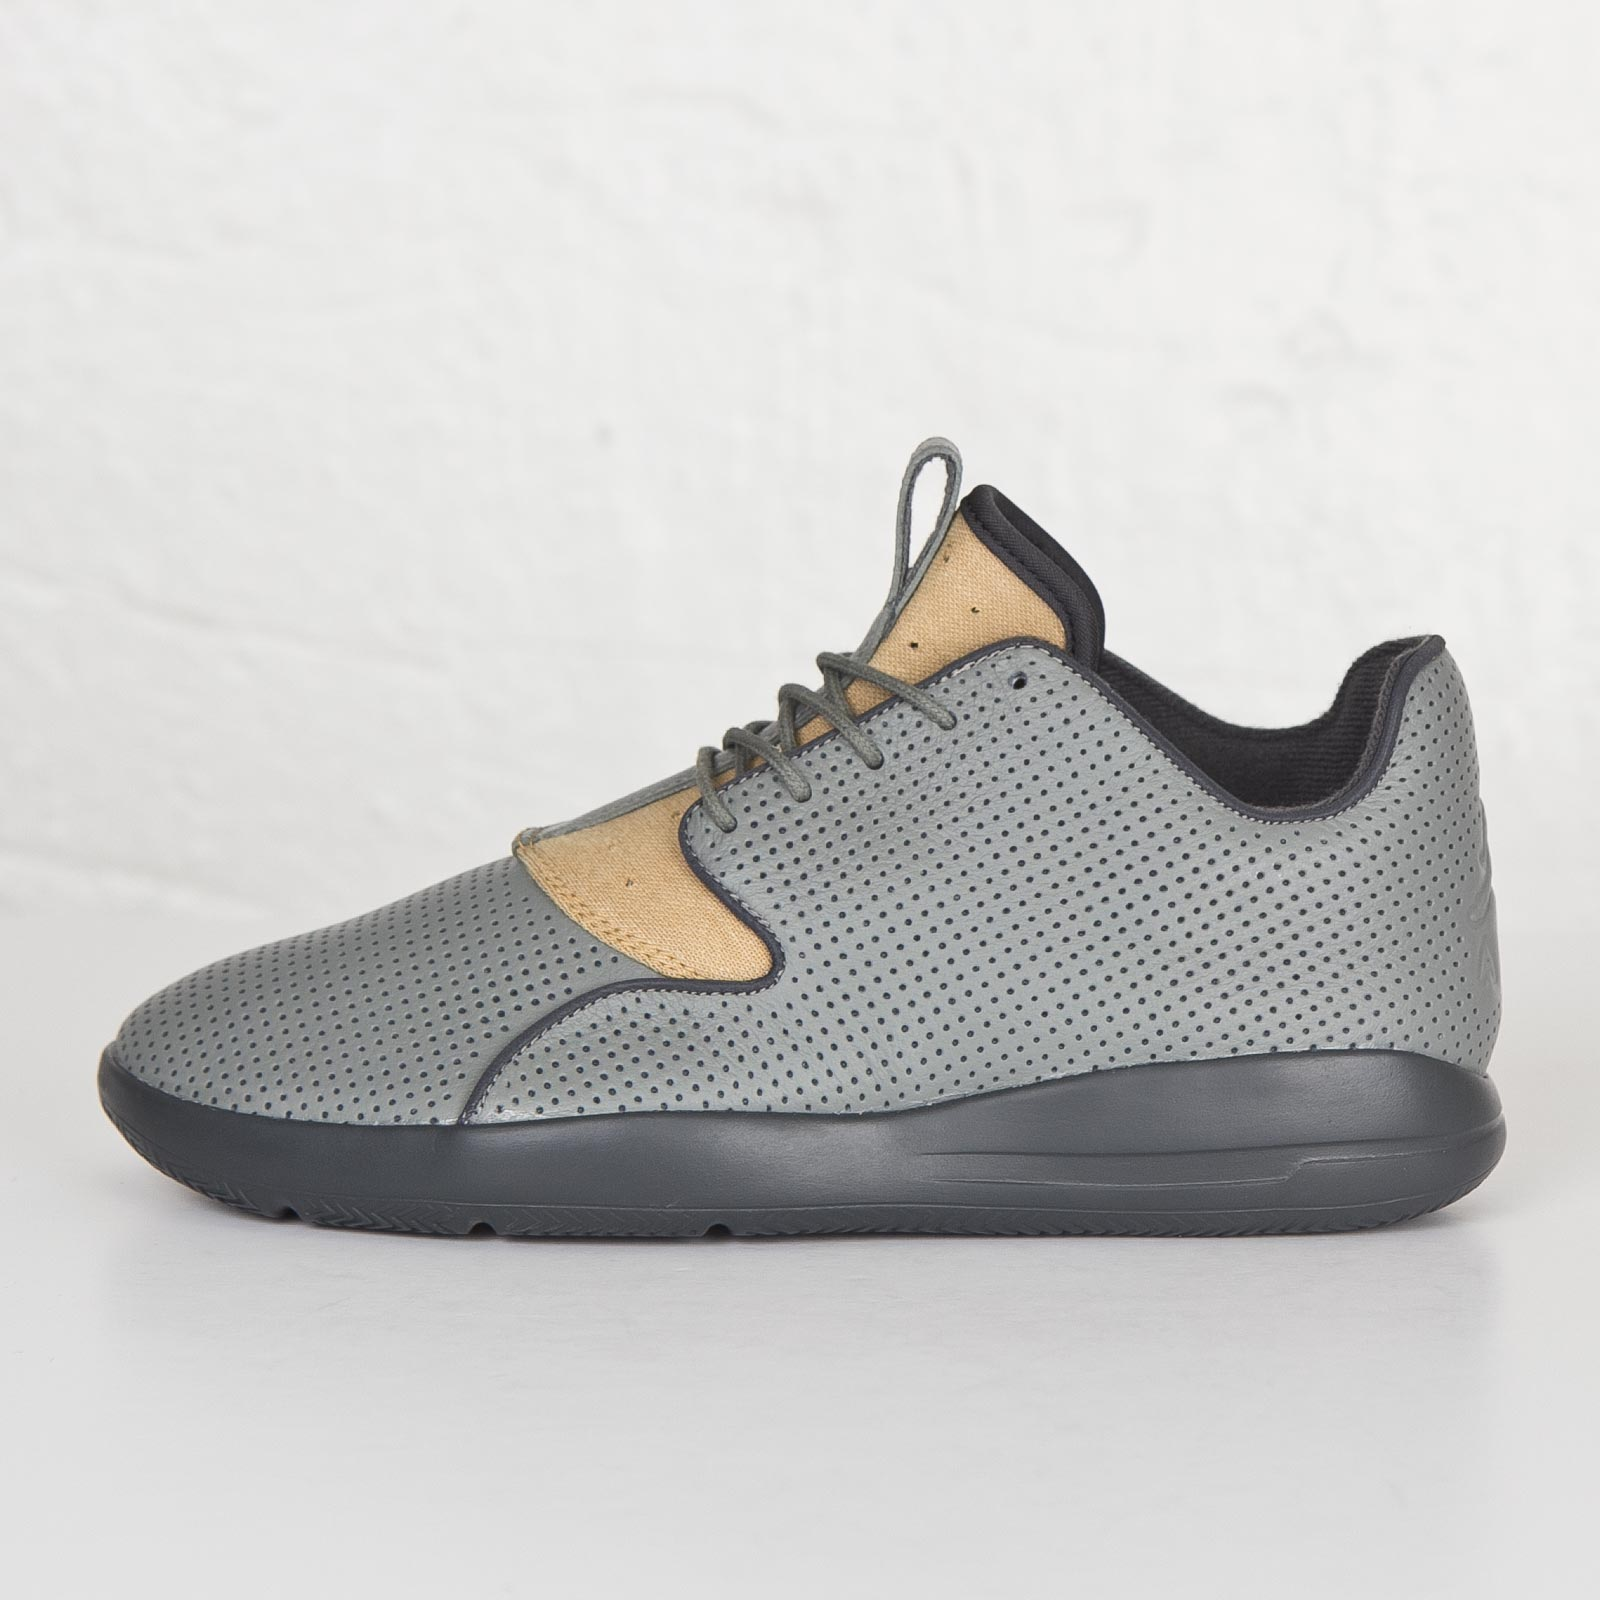 on sale 96b85 68cab Jordan Brand Jordan Eclipse LTR - 807706-034 - Sneakersnstuff   sneakers    streetwear på nätet sen 1999